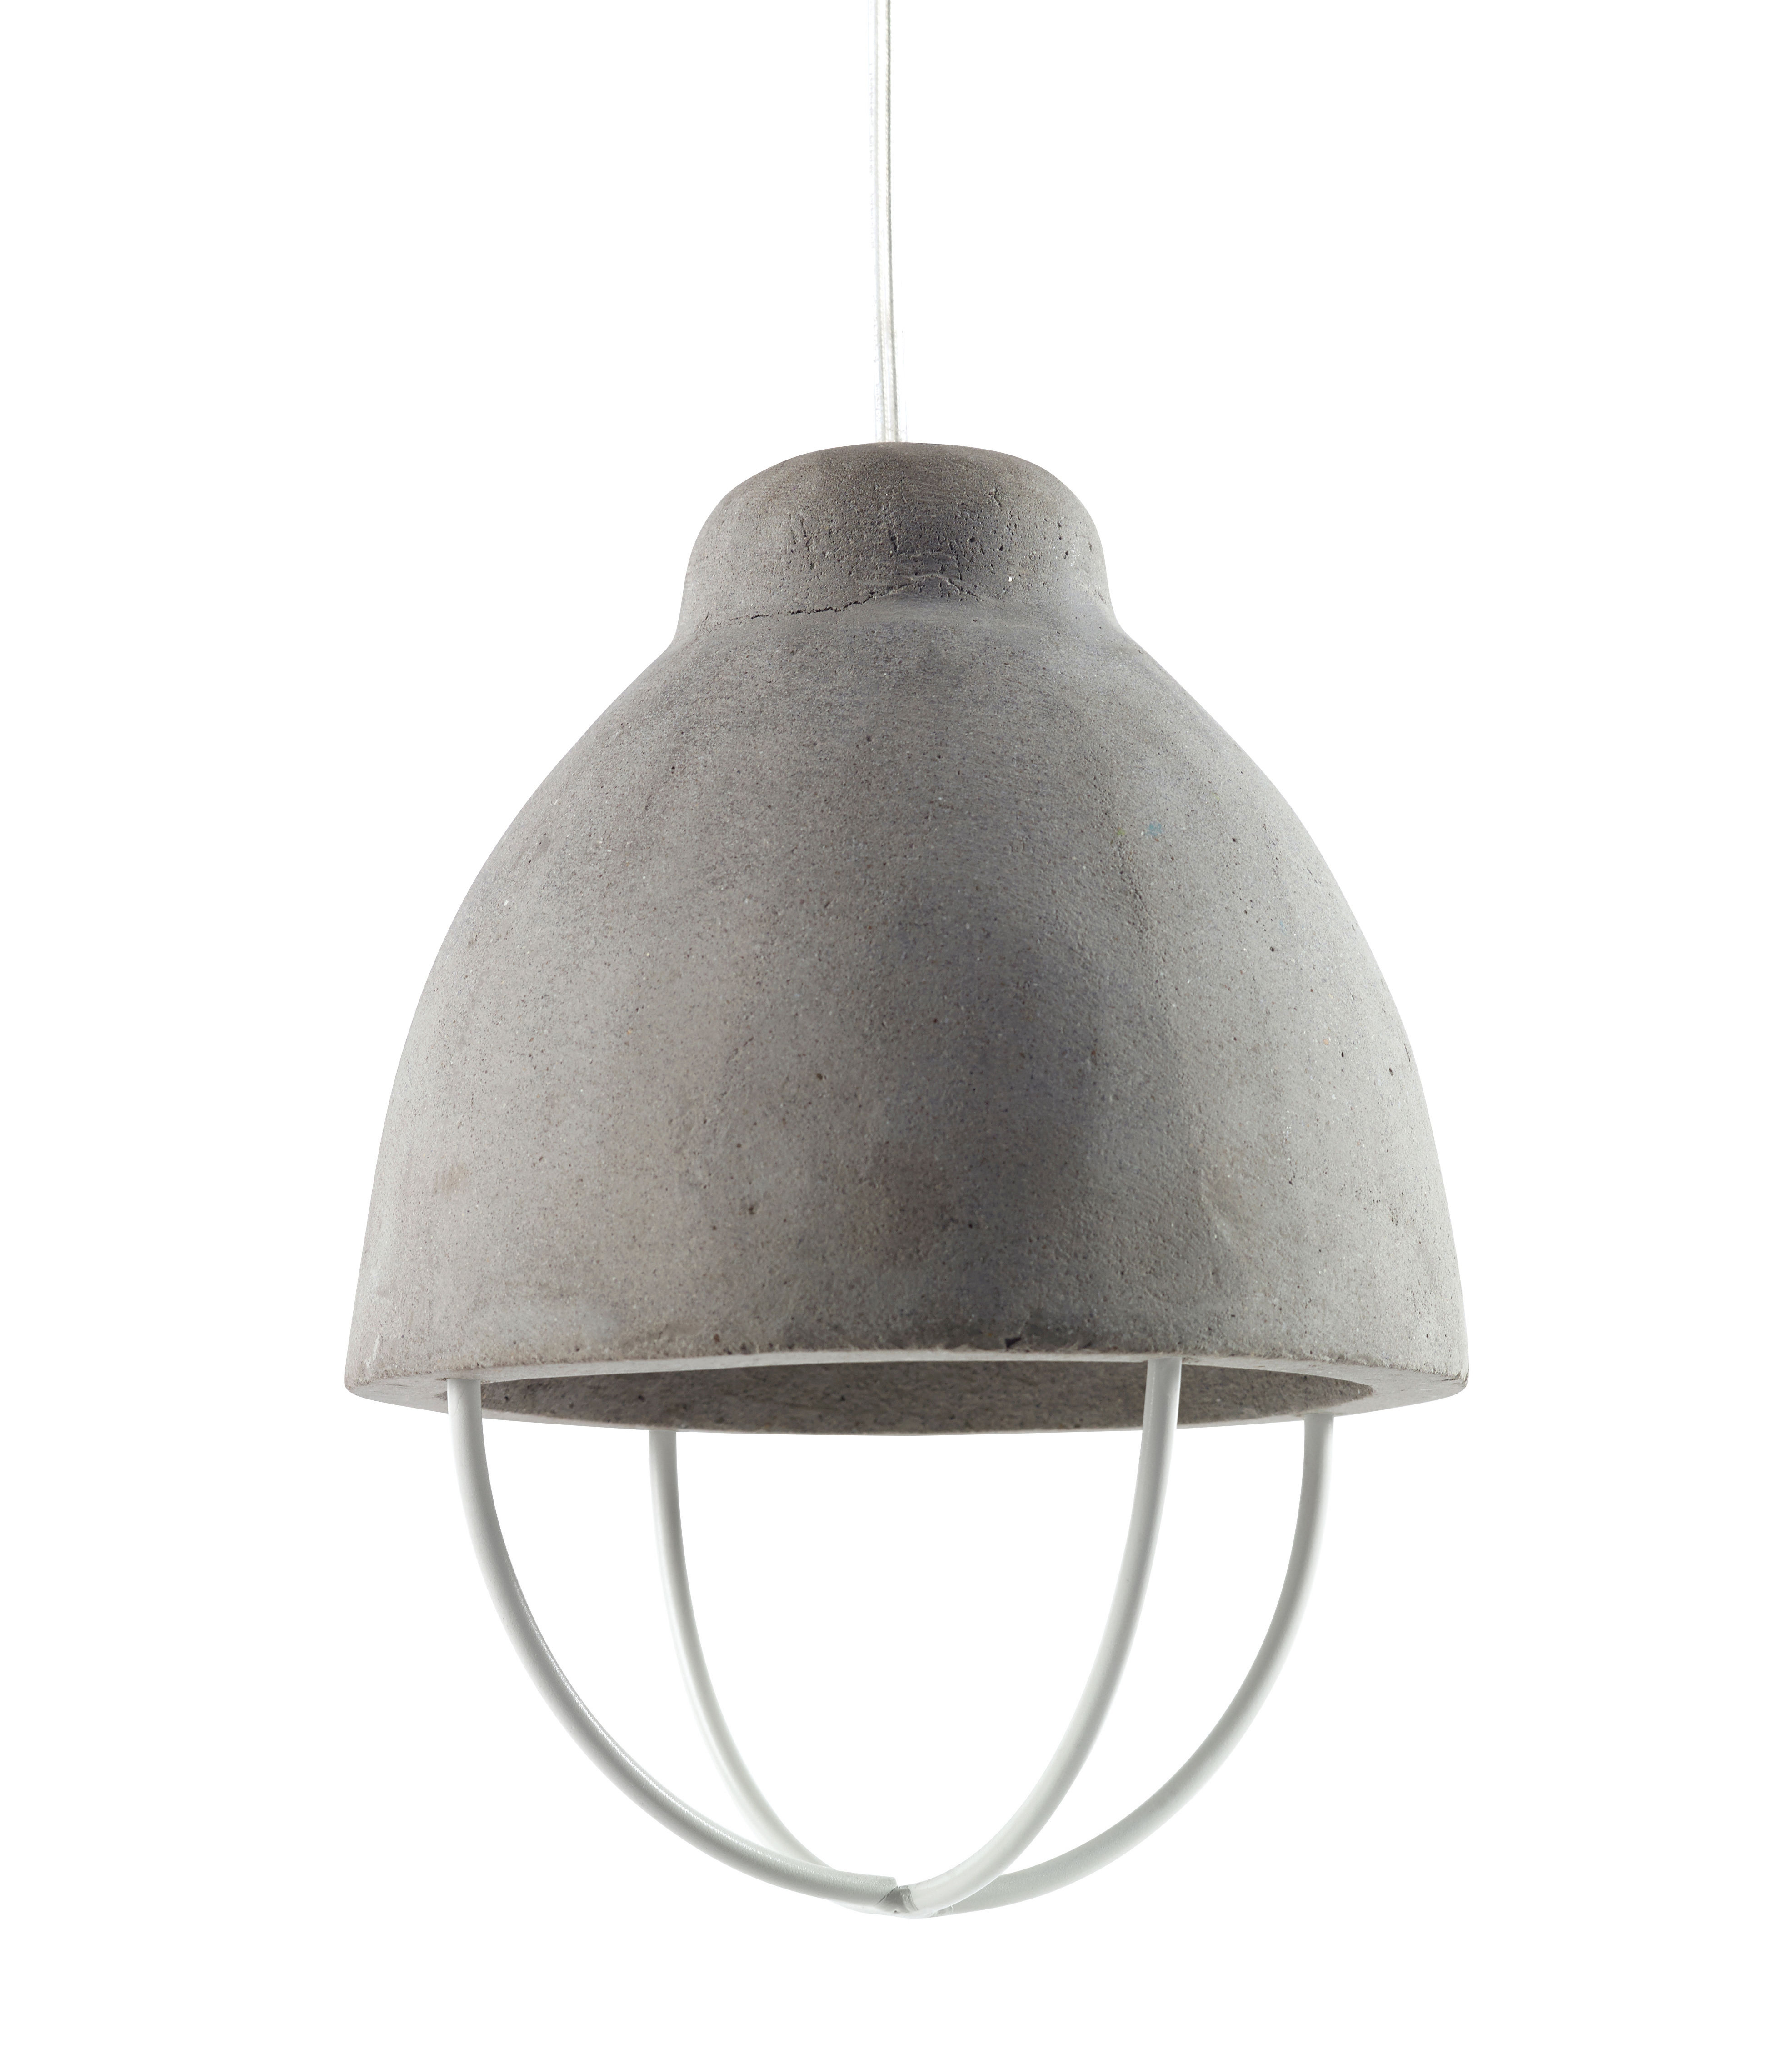 Luminaire - Suspensions - Suspension Feeling / Béton & métal - Serax - Béton gris / Métal blanc - Béton brut, Métal peint